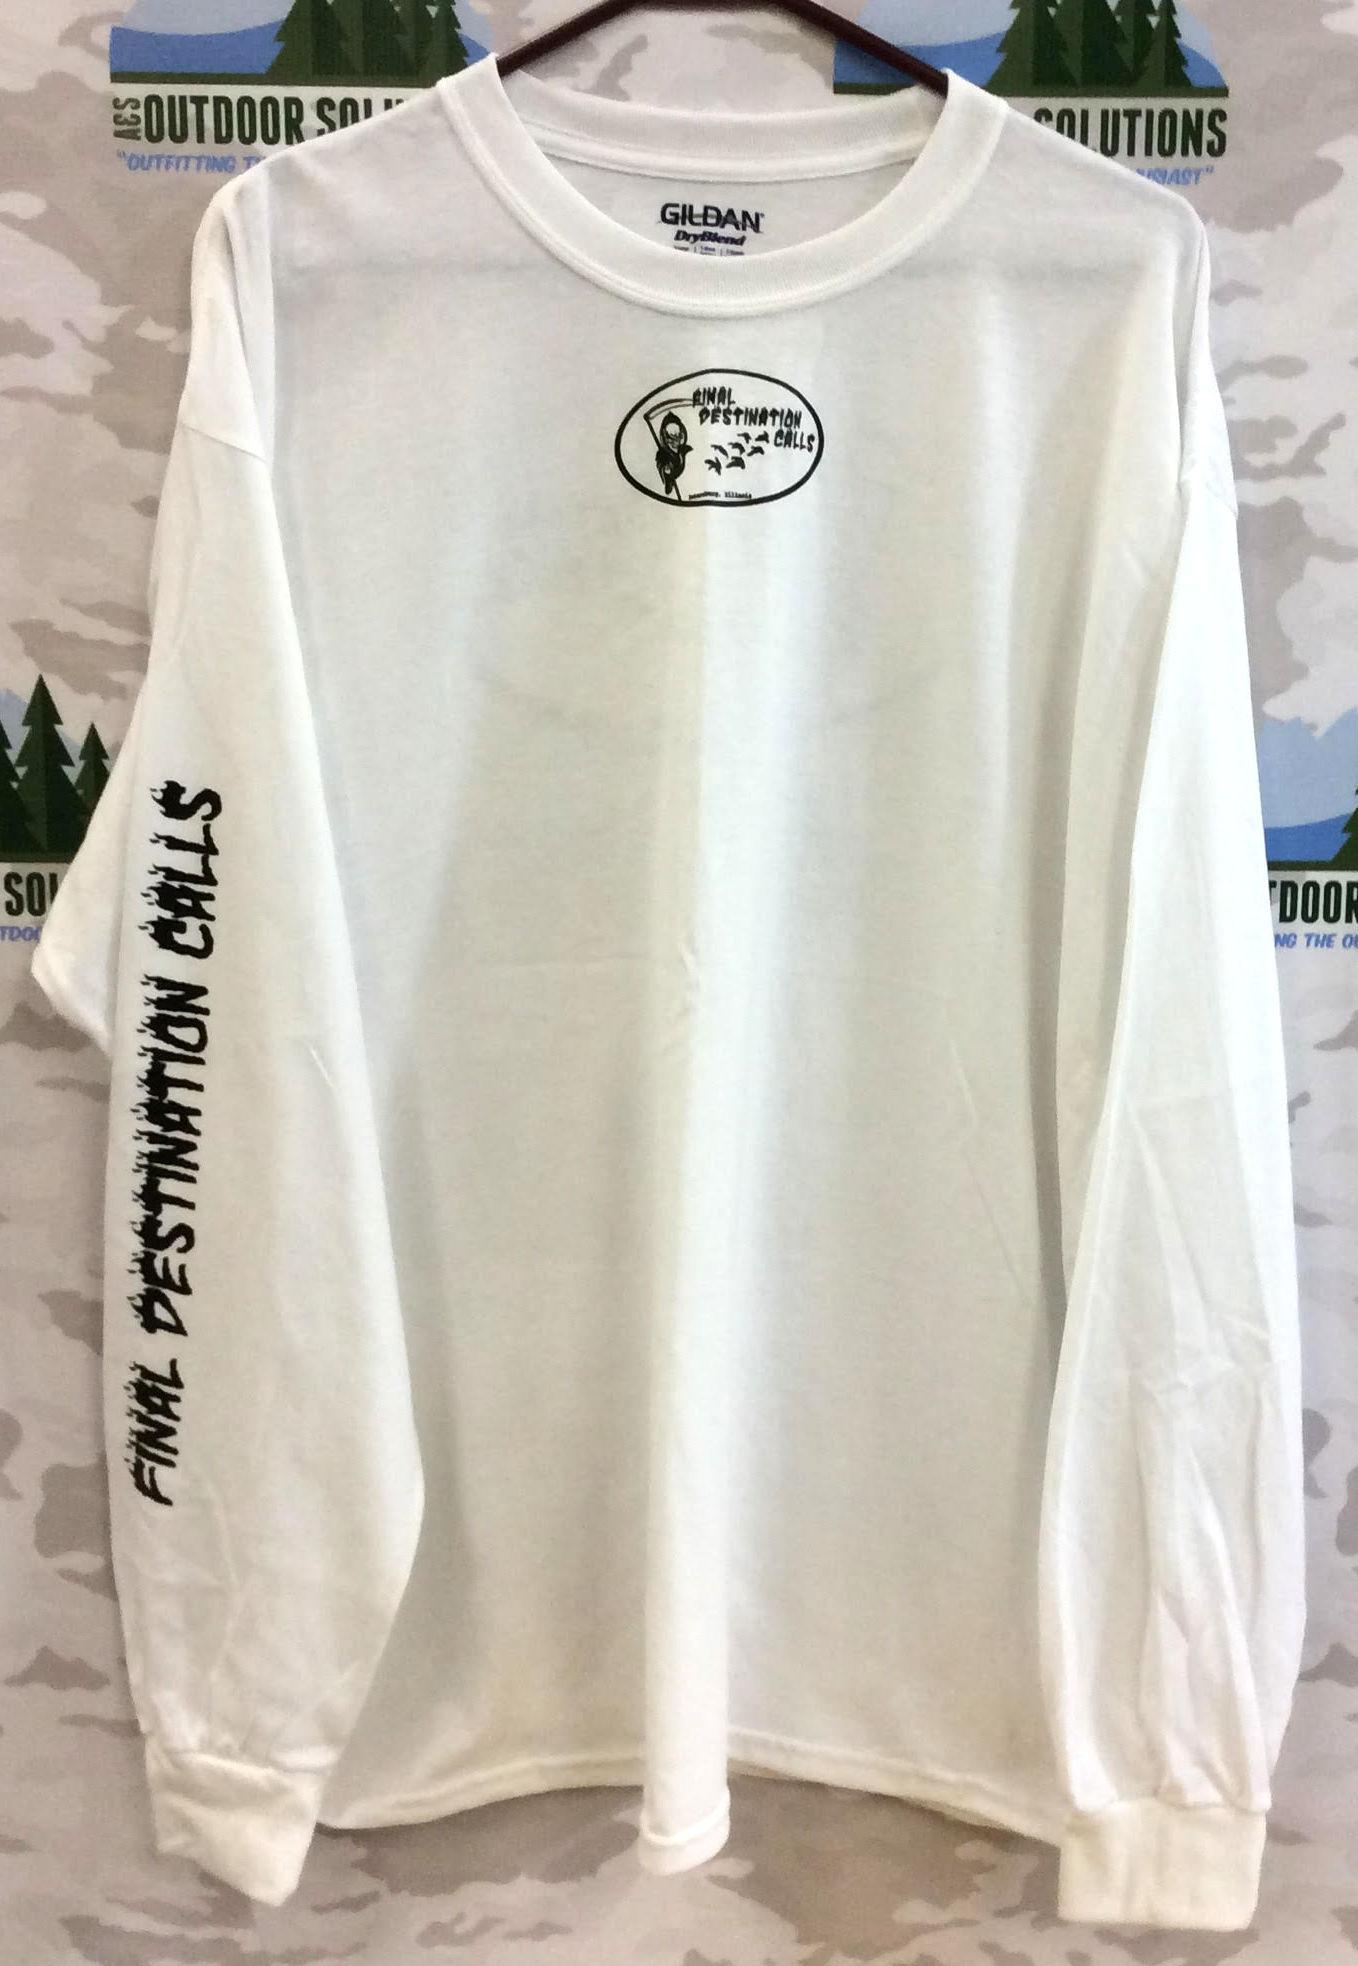 Final Destination Calls Tee Shirt Printed Long Sleeve White